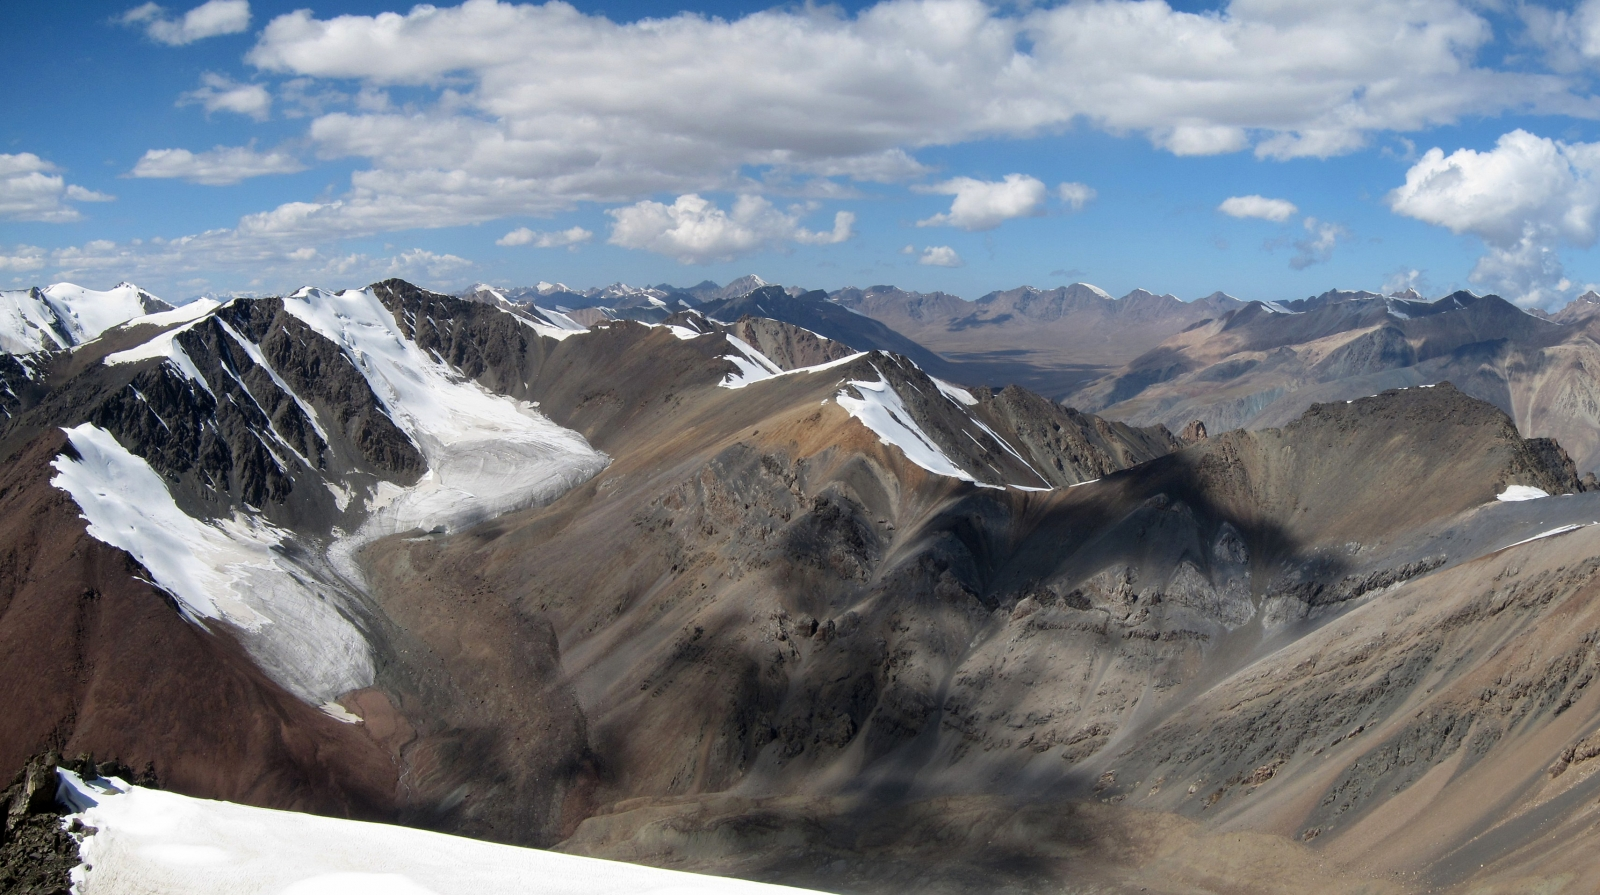 Tien Shan mountain range